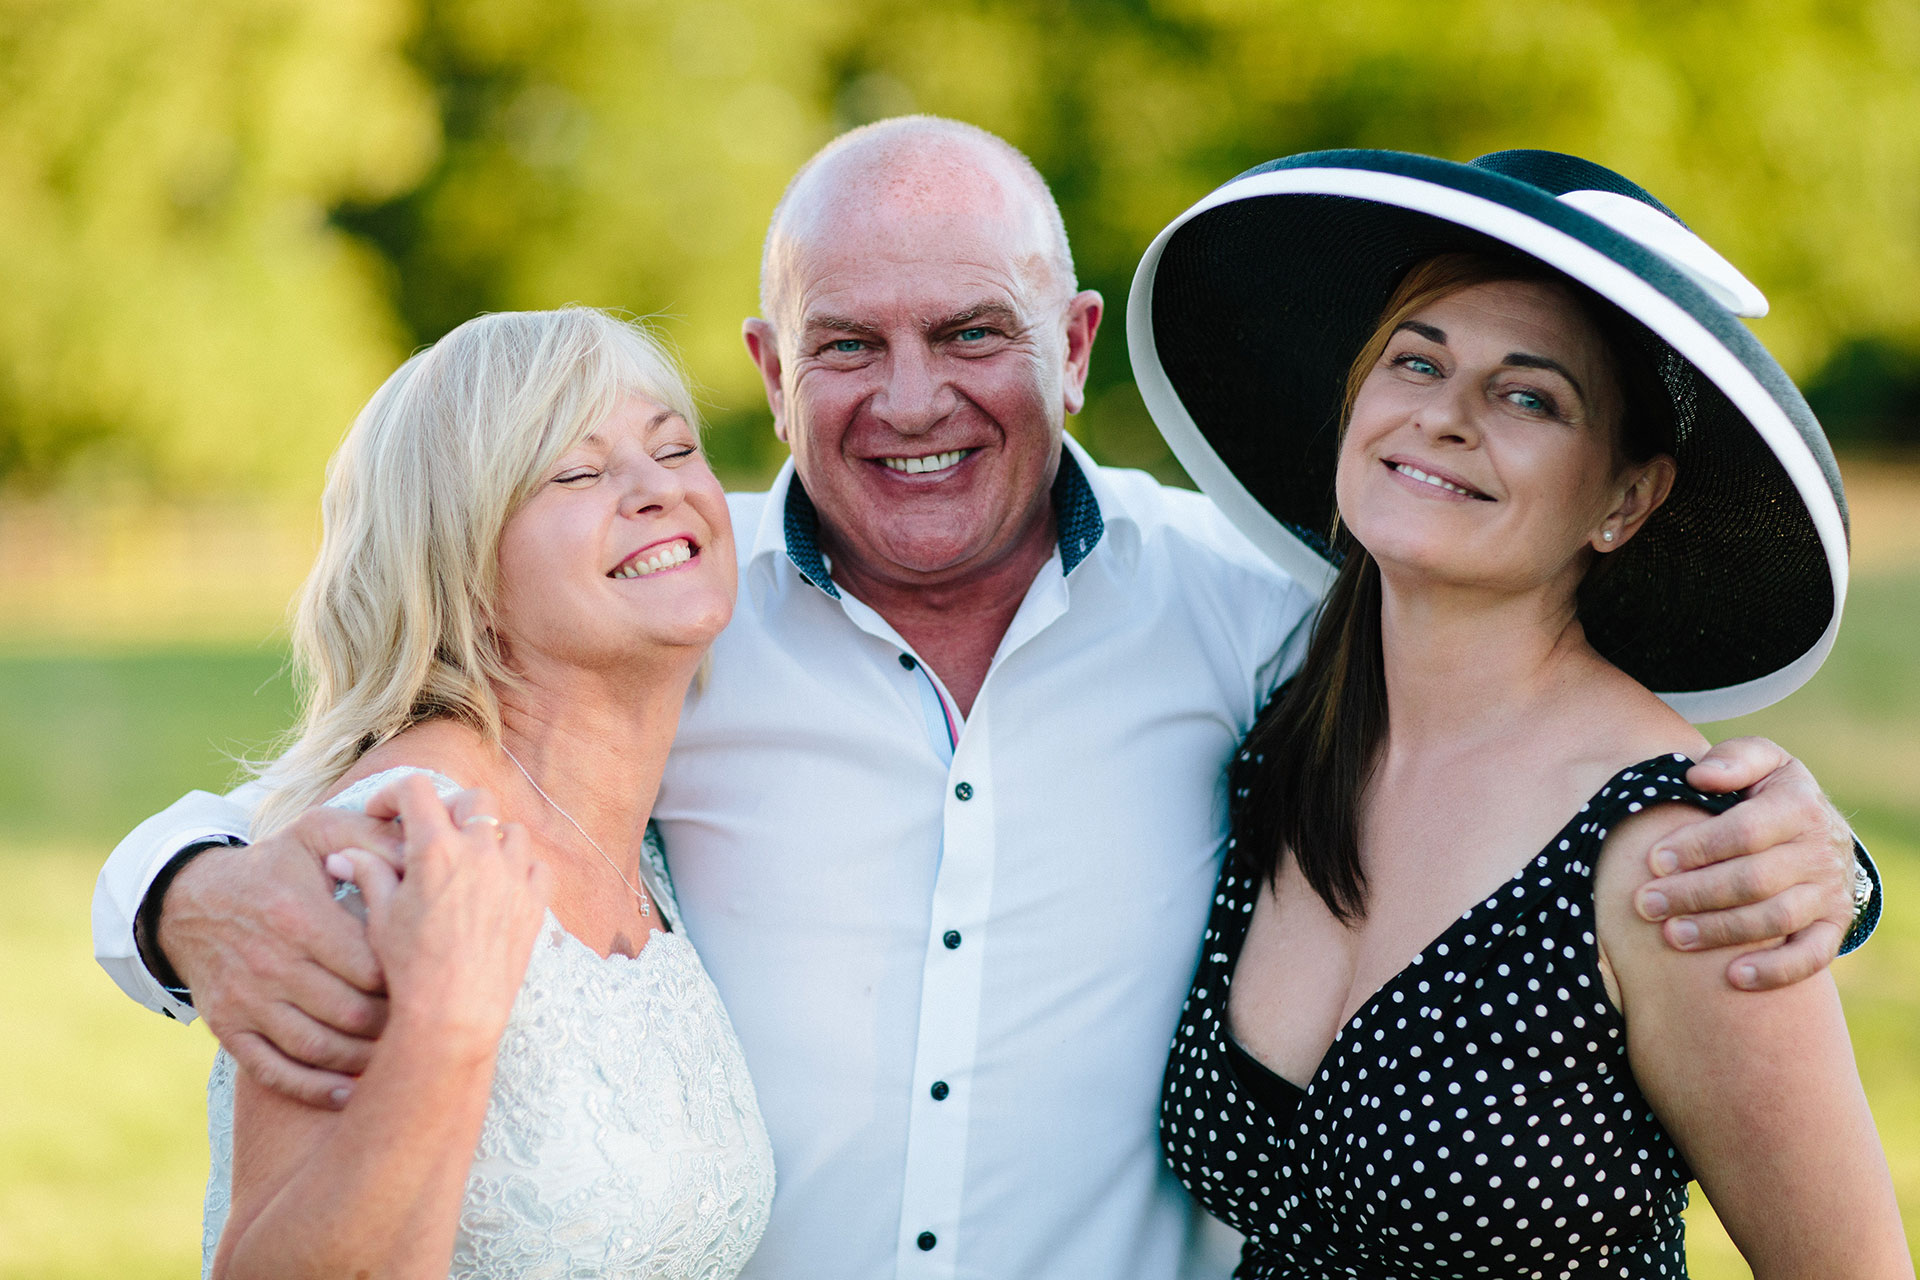 Langar-Hall-wedding-photographer-in-Nottinghamshire-Michael-Newington-Gray-82.jpg